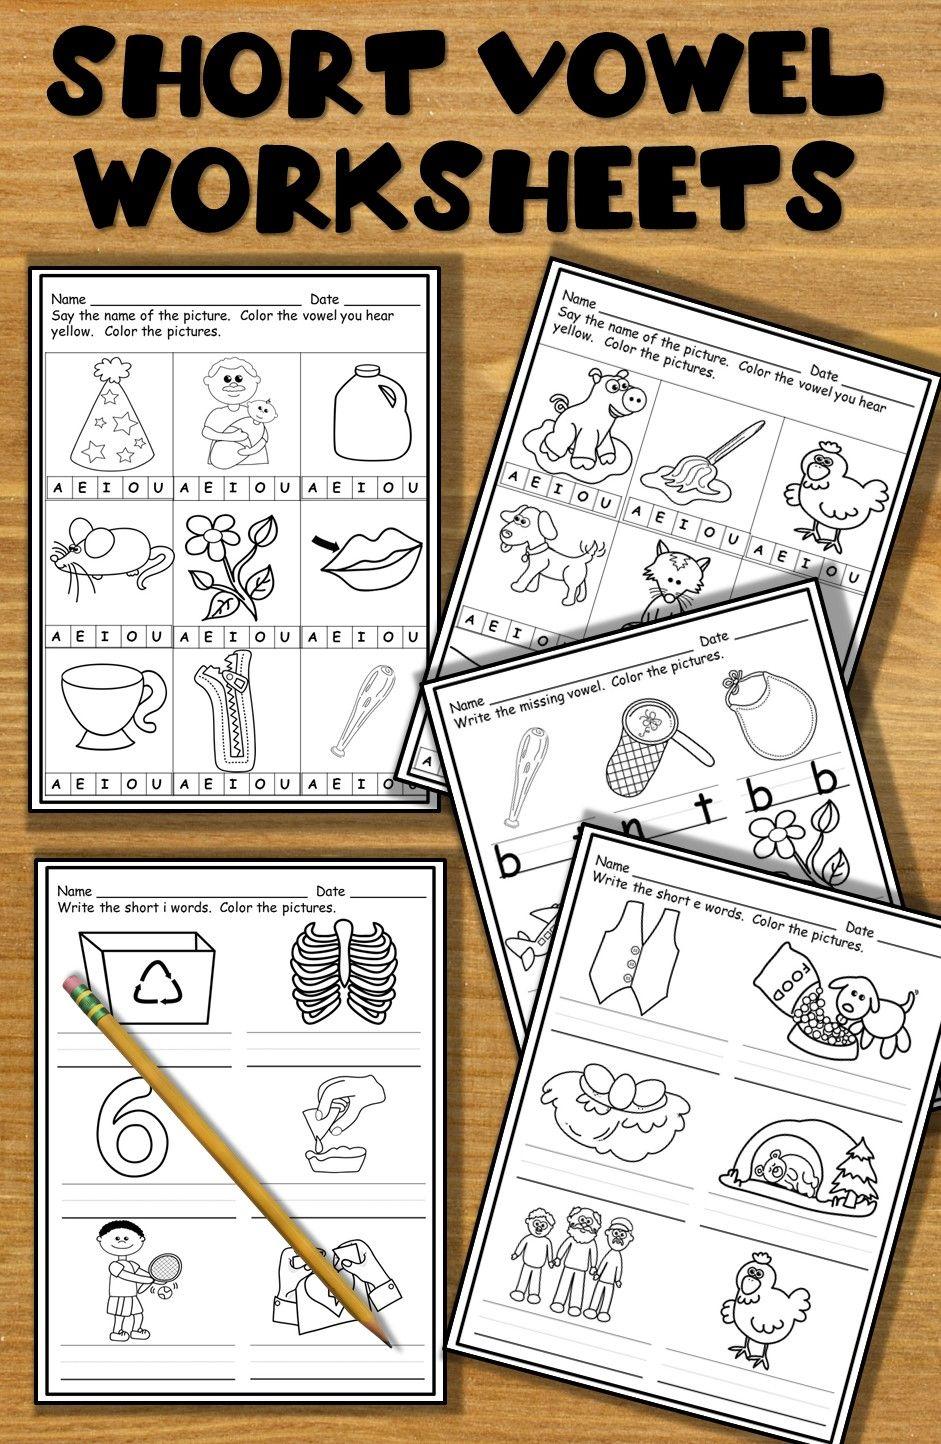 Save Yourself Some Time Just Print And Go Worksheets For Short Vowels Short Vowel Worksheets Vowel Worksheets Short Vowels [ 1444 x 941 Pixel ]